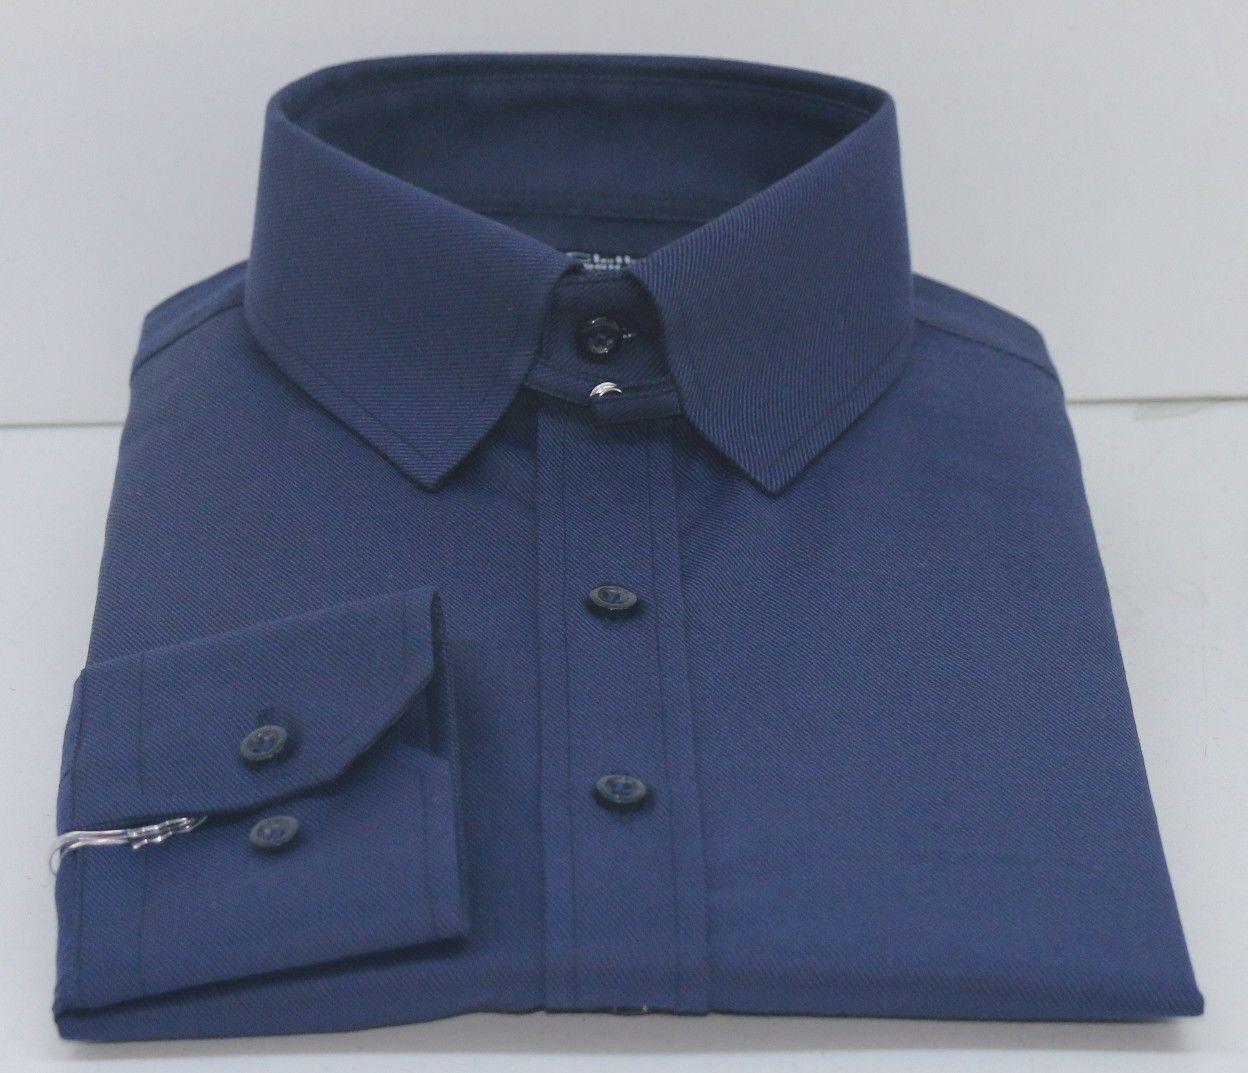 Azul Marino para Hombre Tab Cuello de Camisa Manga Larga James Bond